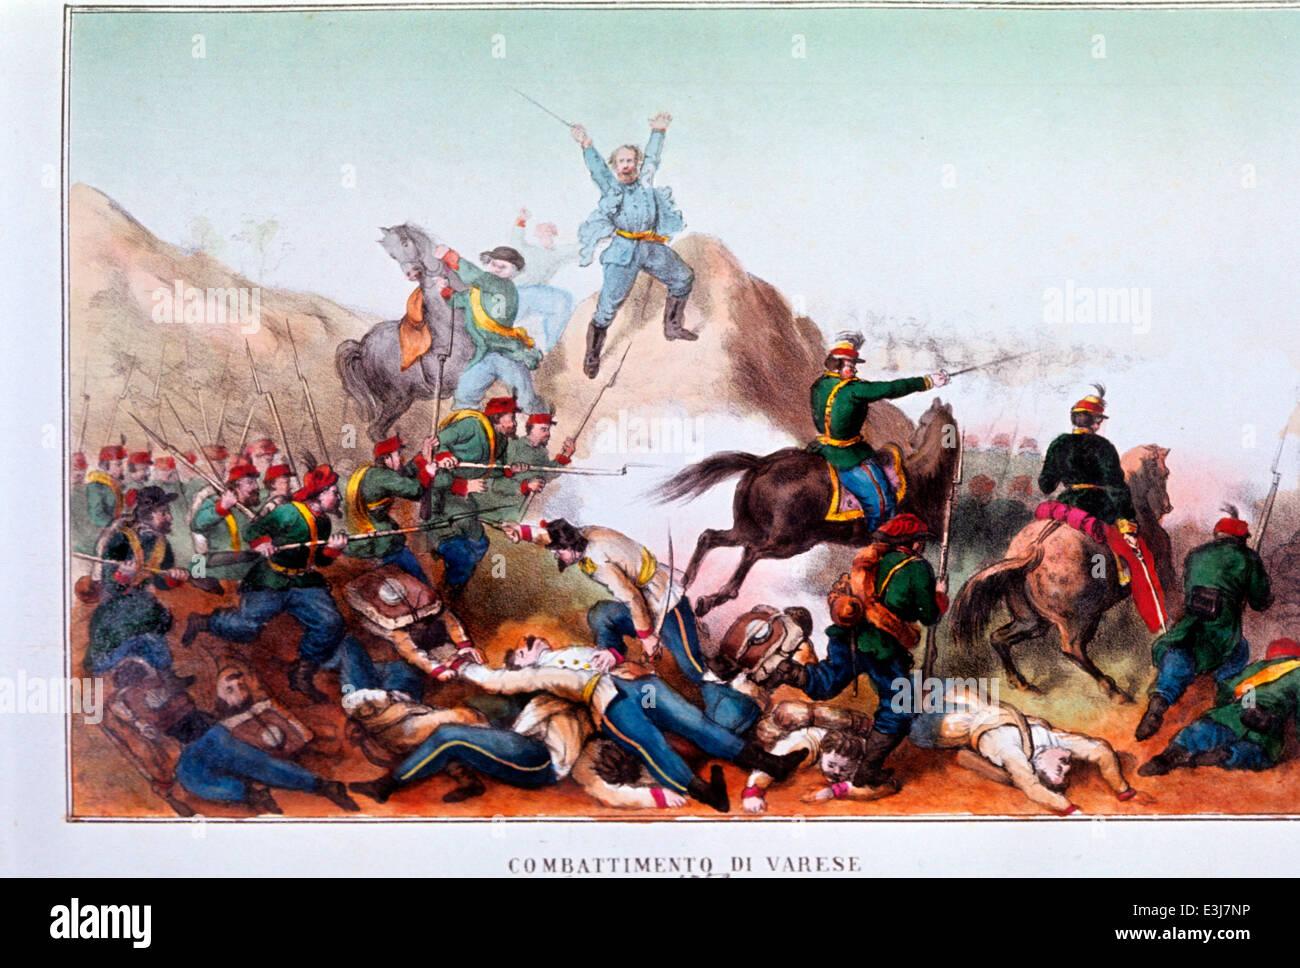 Fighting varese May 1859,giuseppe garibaldi'' - Stock Image